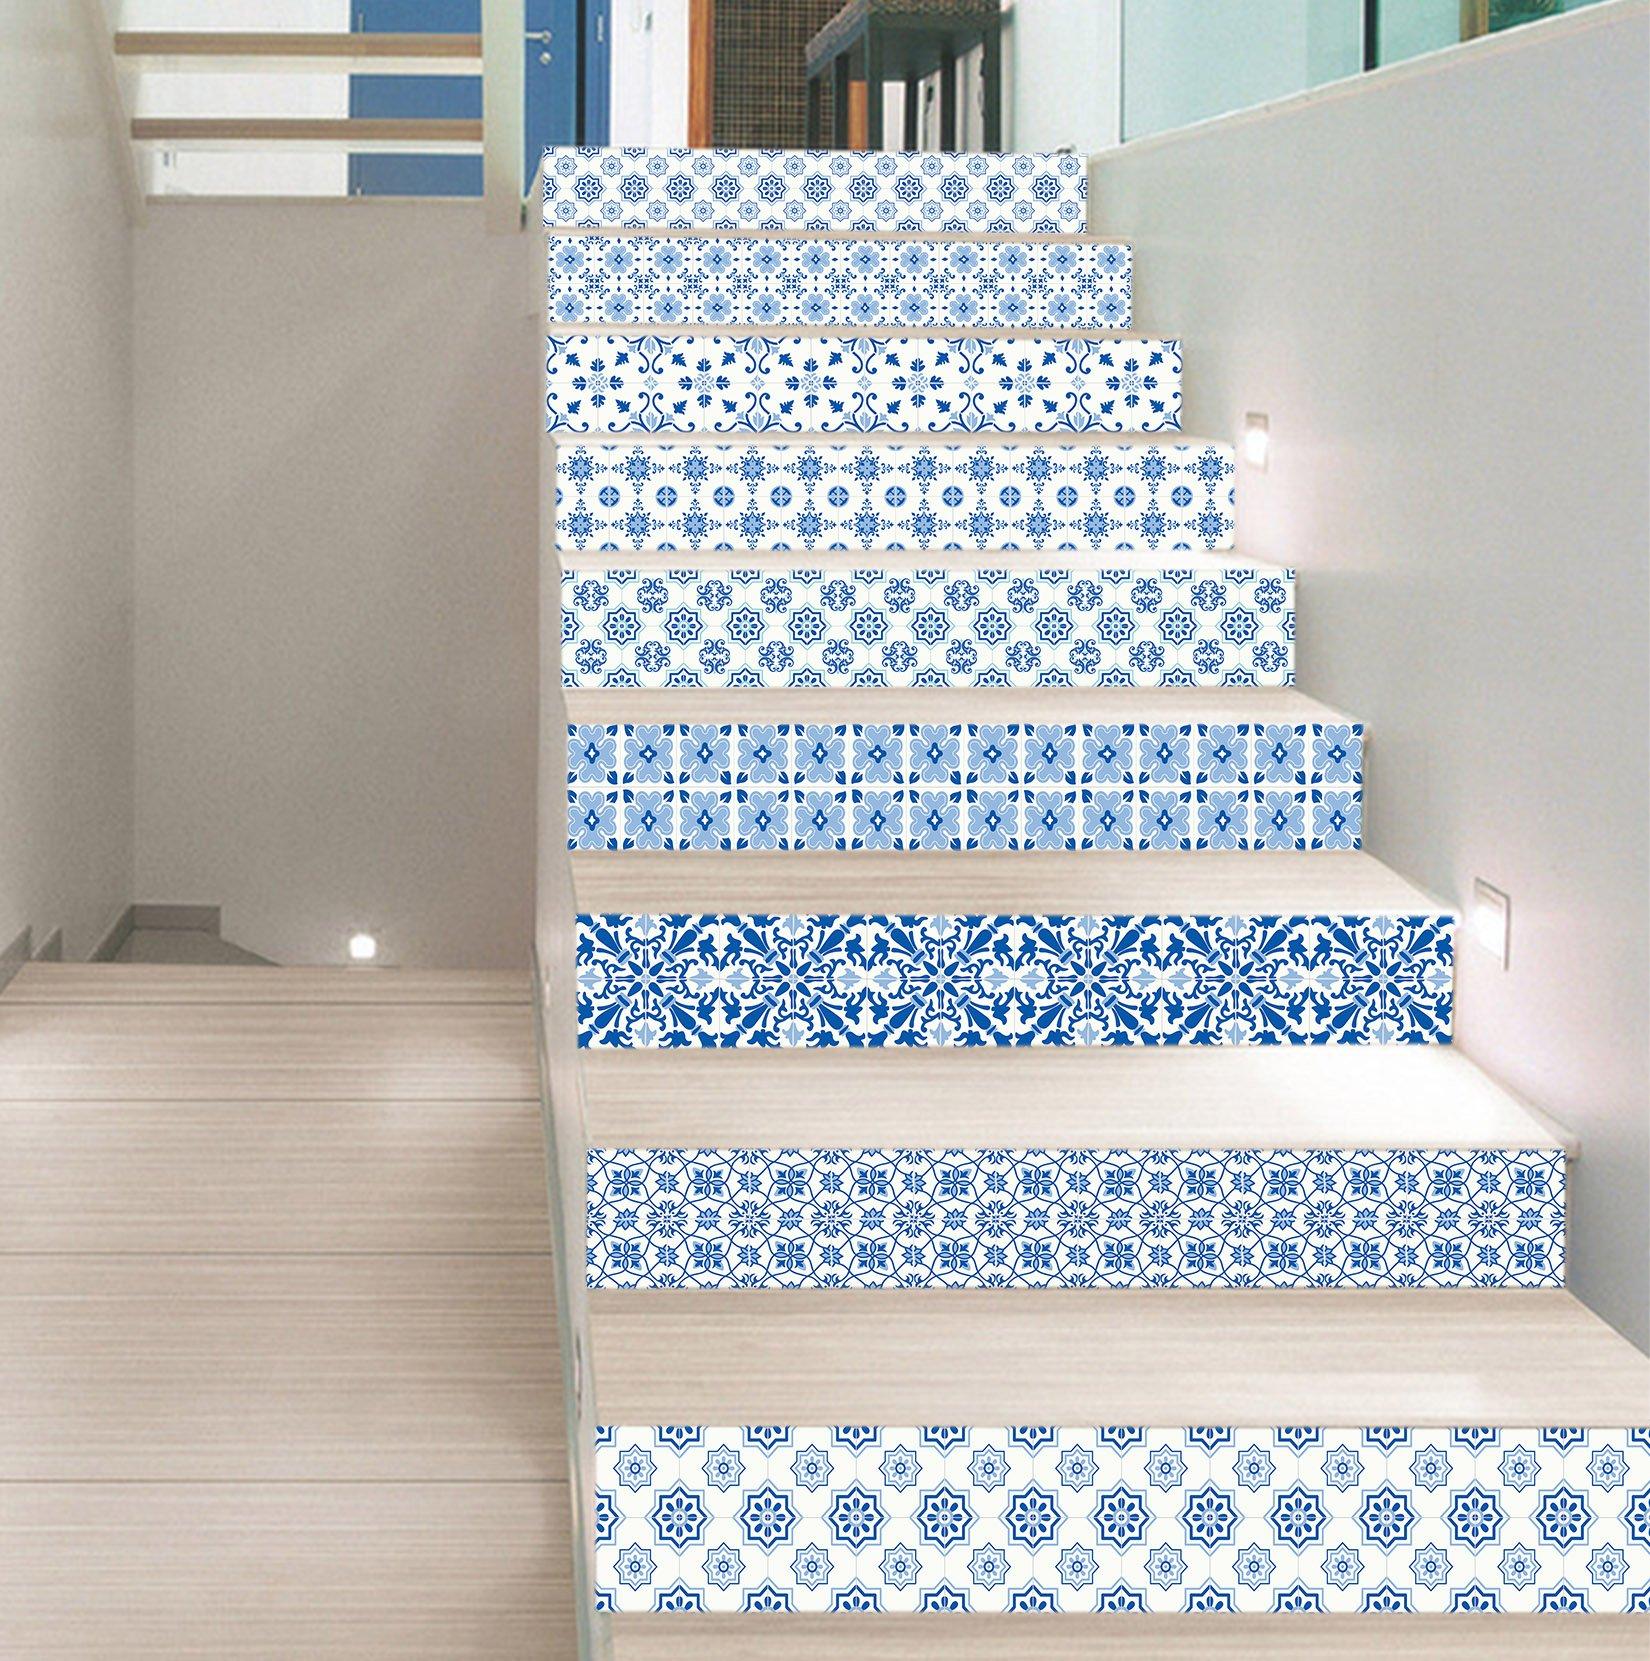 3D Clear Blue Pattern 7843 Stair Risers Decoration Photo Mural Vinyl Decal Wallpaper Murals Wallpaper Mural US Lemon (15x H:18cm x W:94cm (7''x37'')) by AJ WALLPAPER (Image #2)